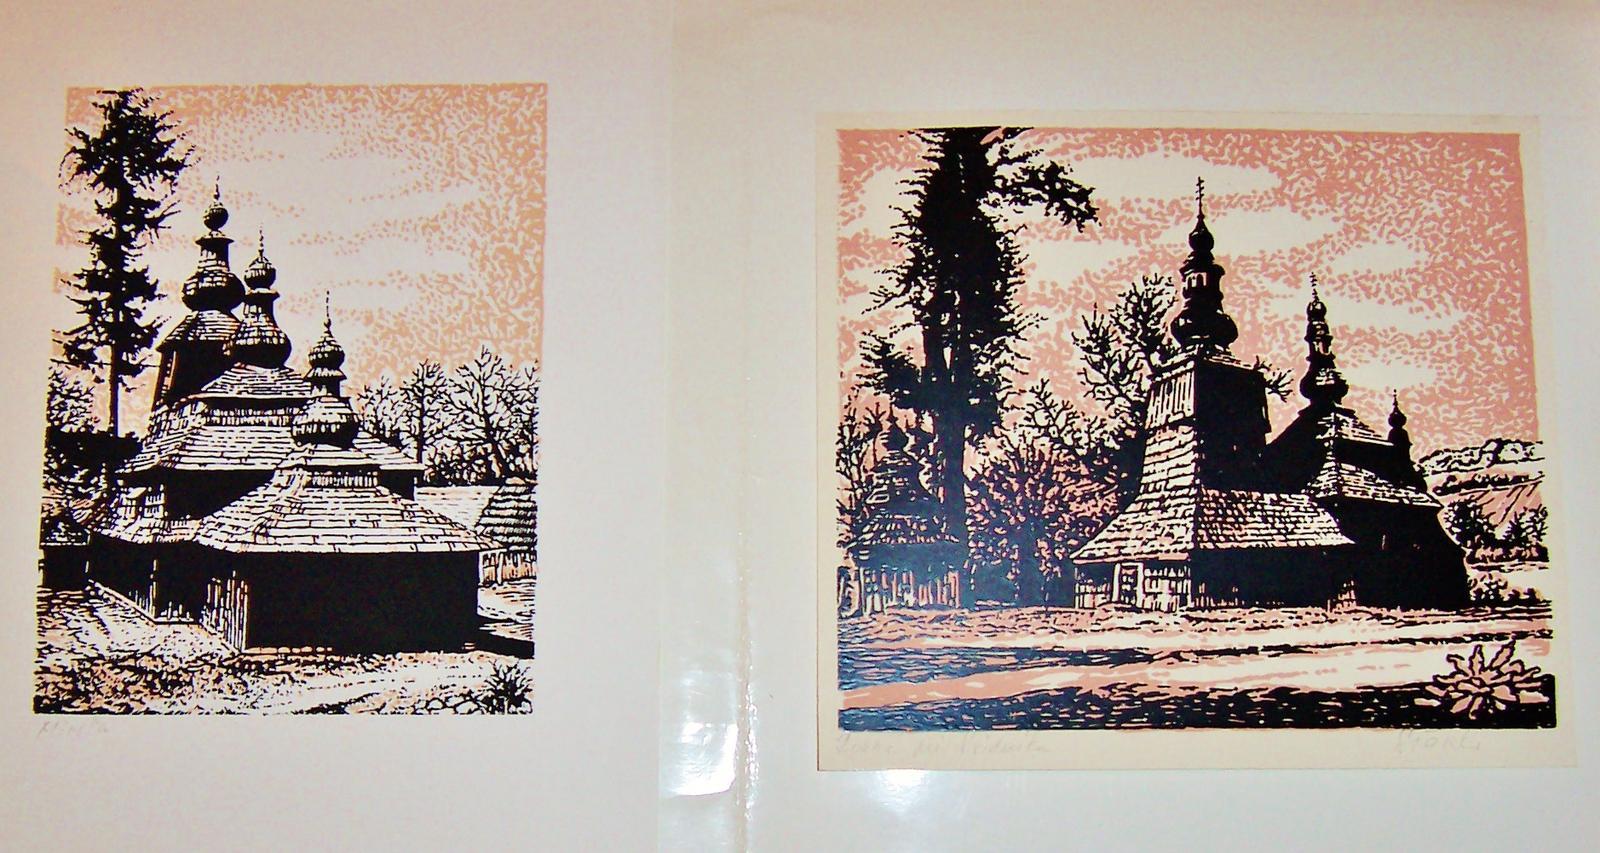 Originál grafiky,Drevené kostolíky,2ks - Obrázok č. 1